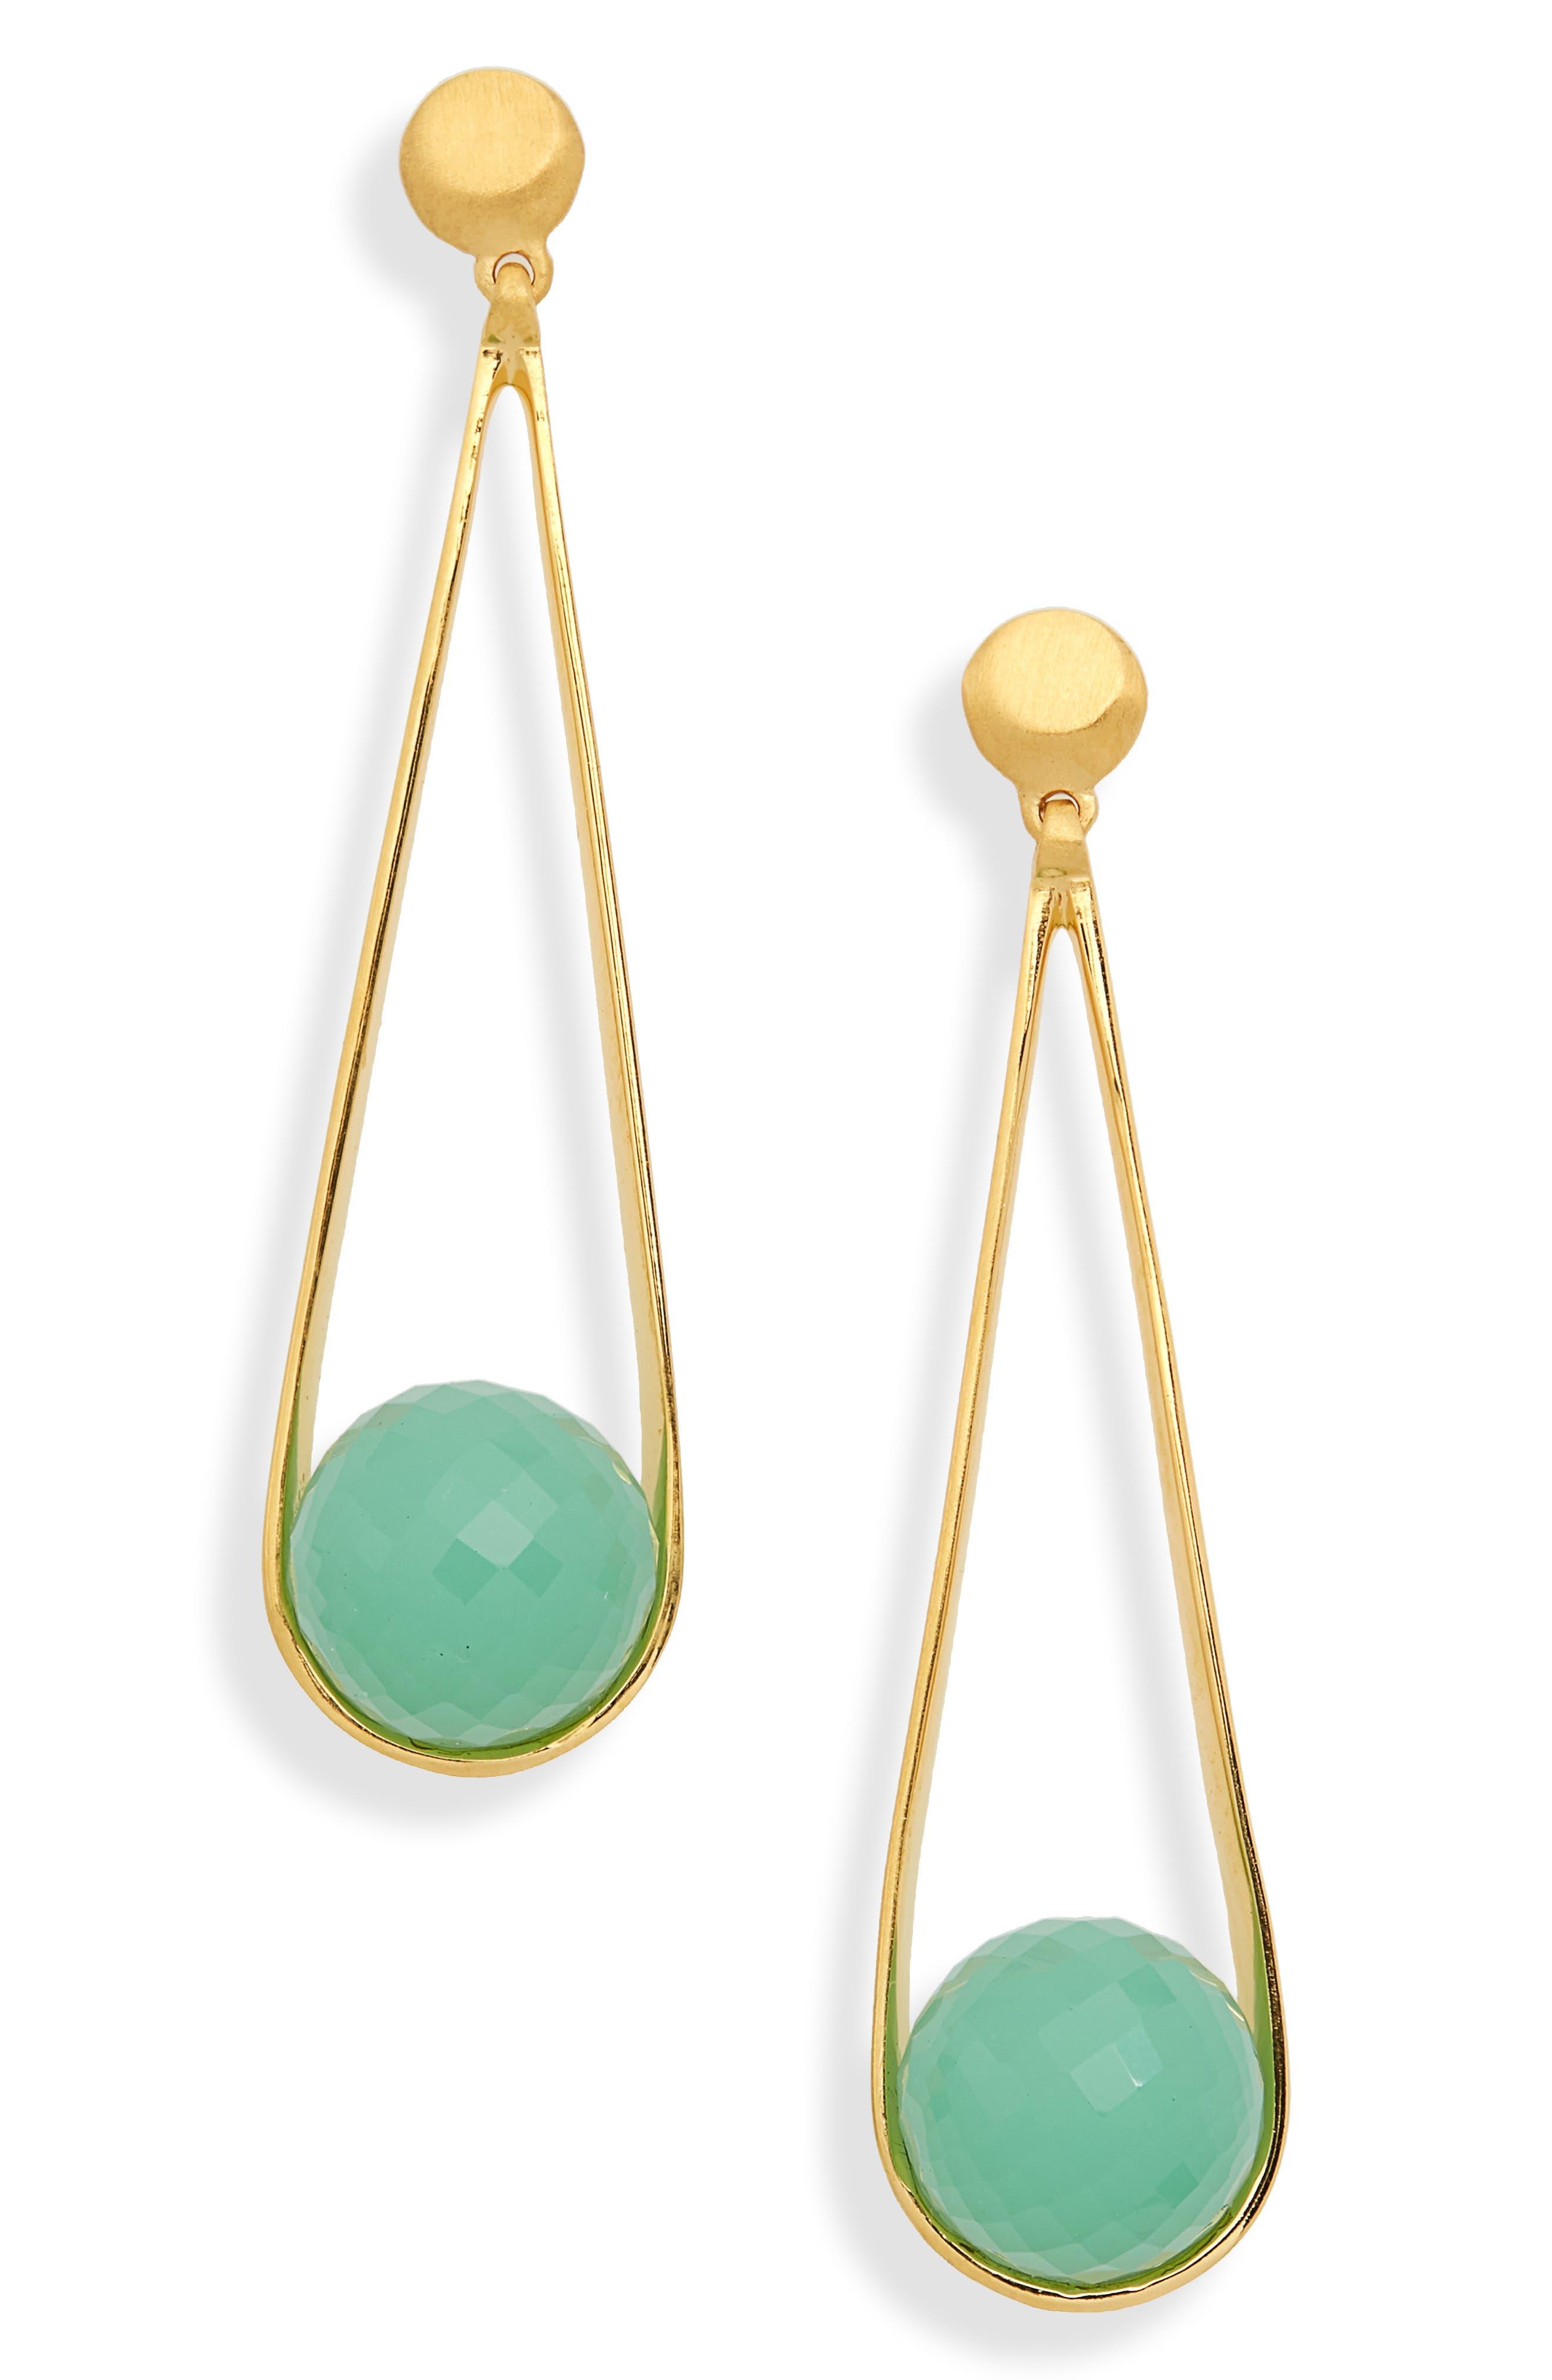 Ipanema Earrings,                         Main,                         color, Ocean Blue Chalcedony/ Gold